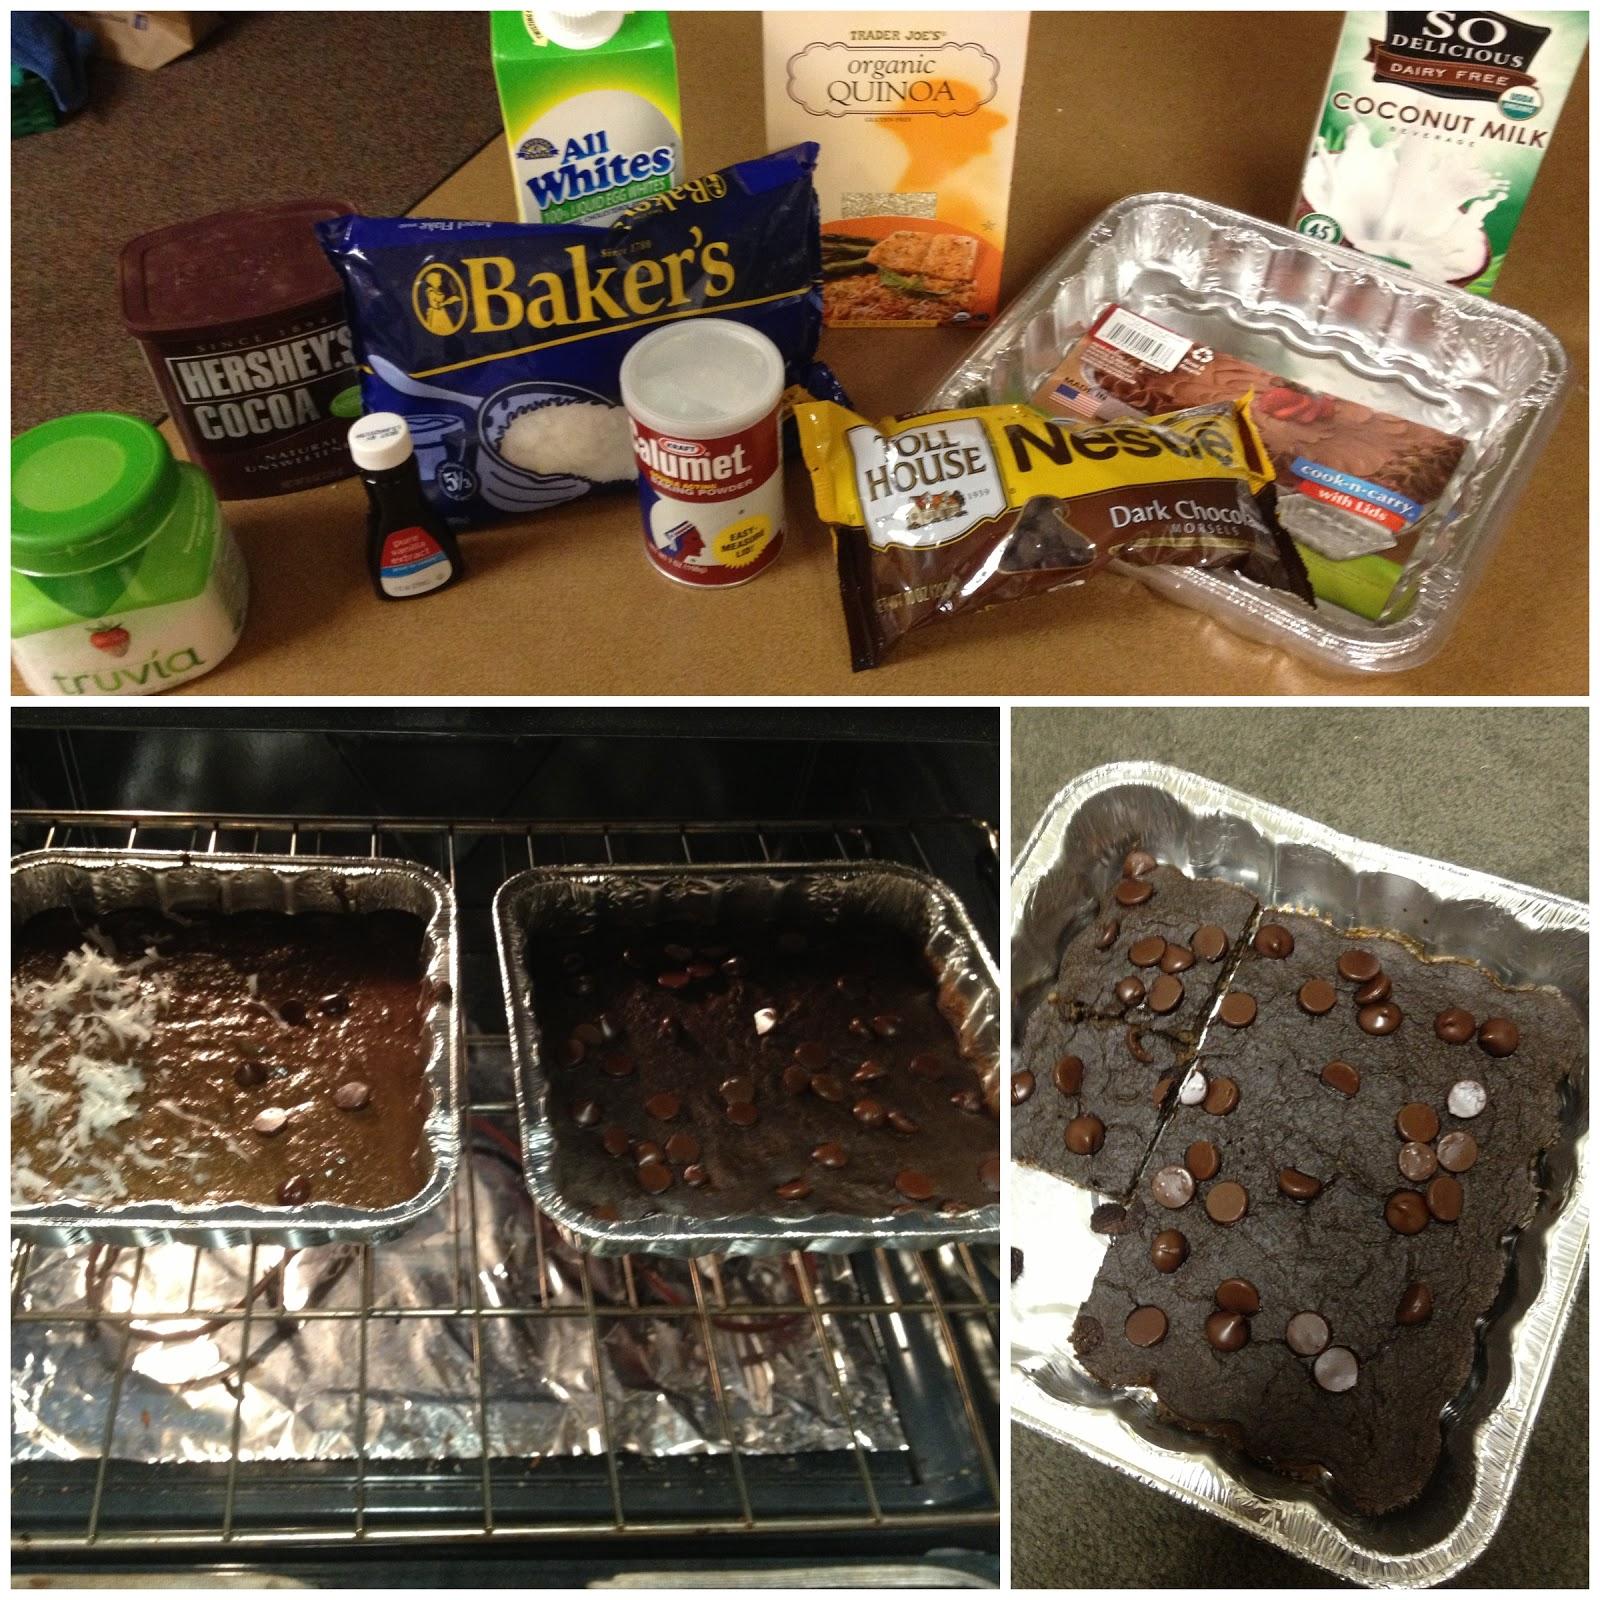 Healthy Chocolate Quinoa Brownies